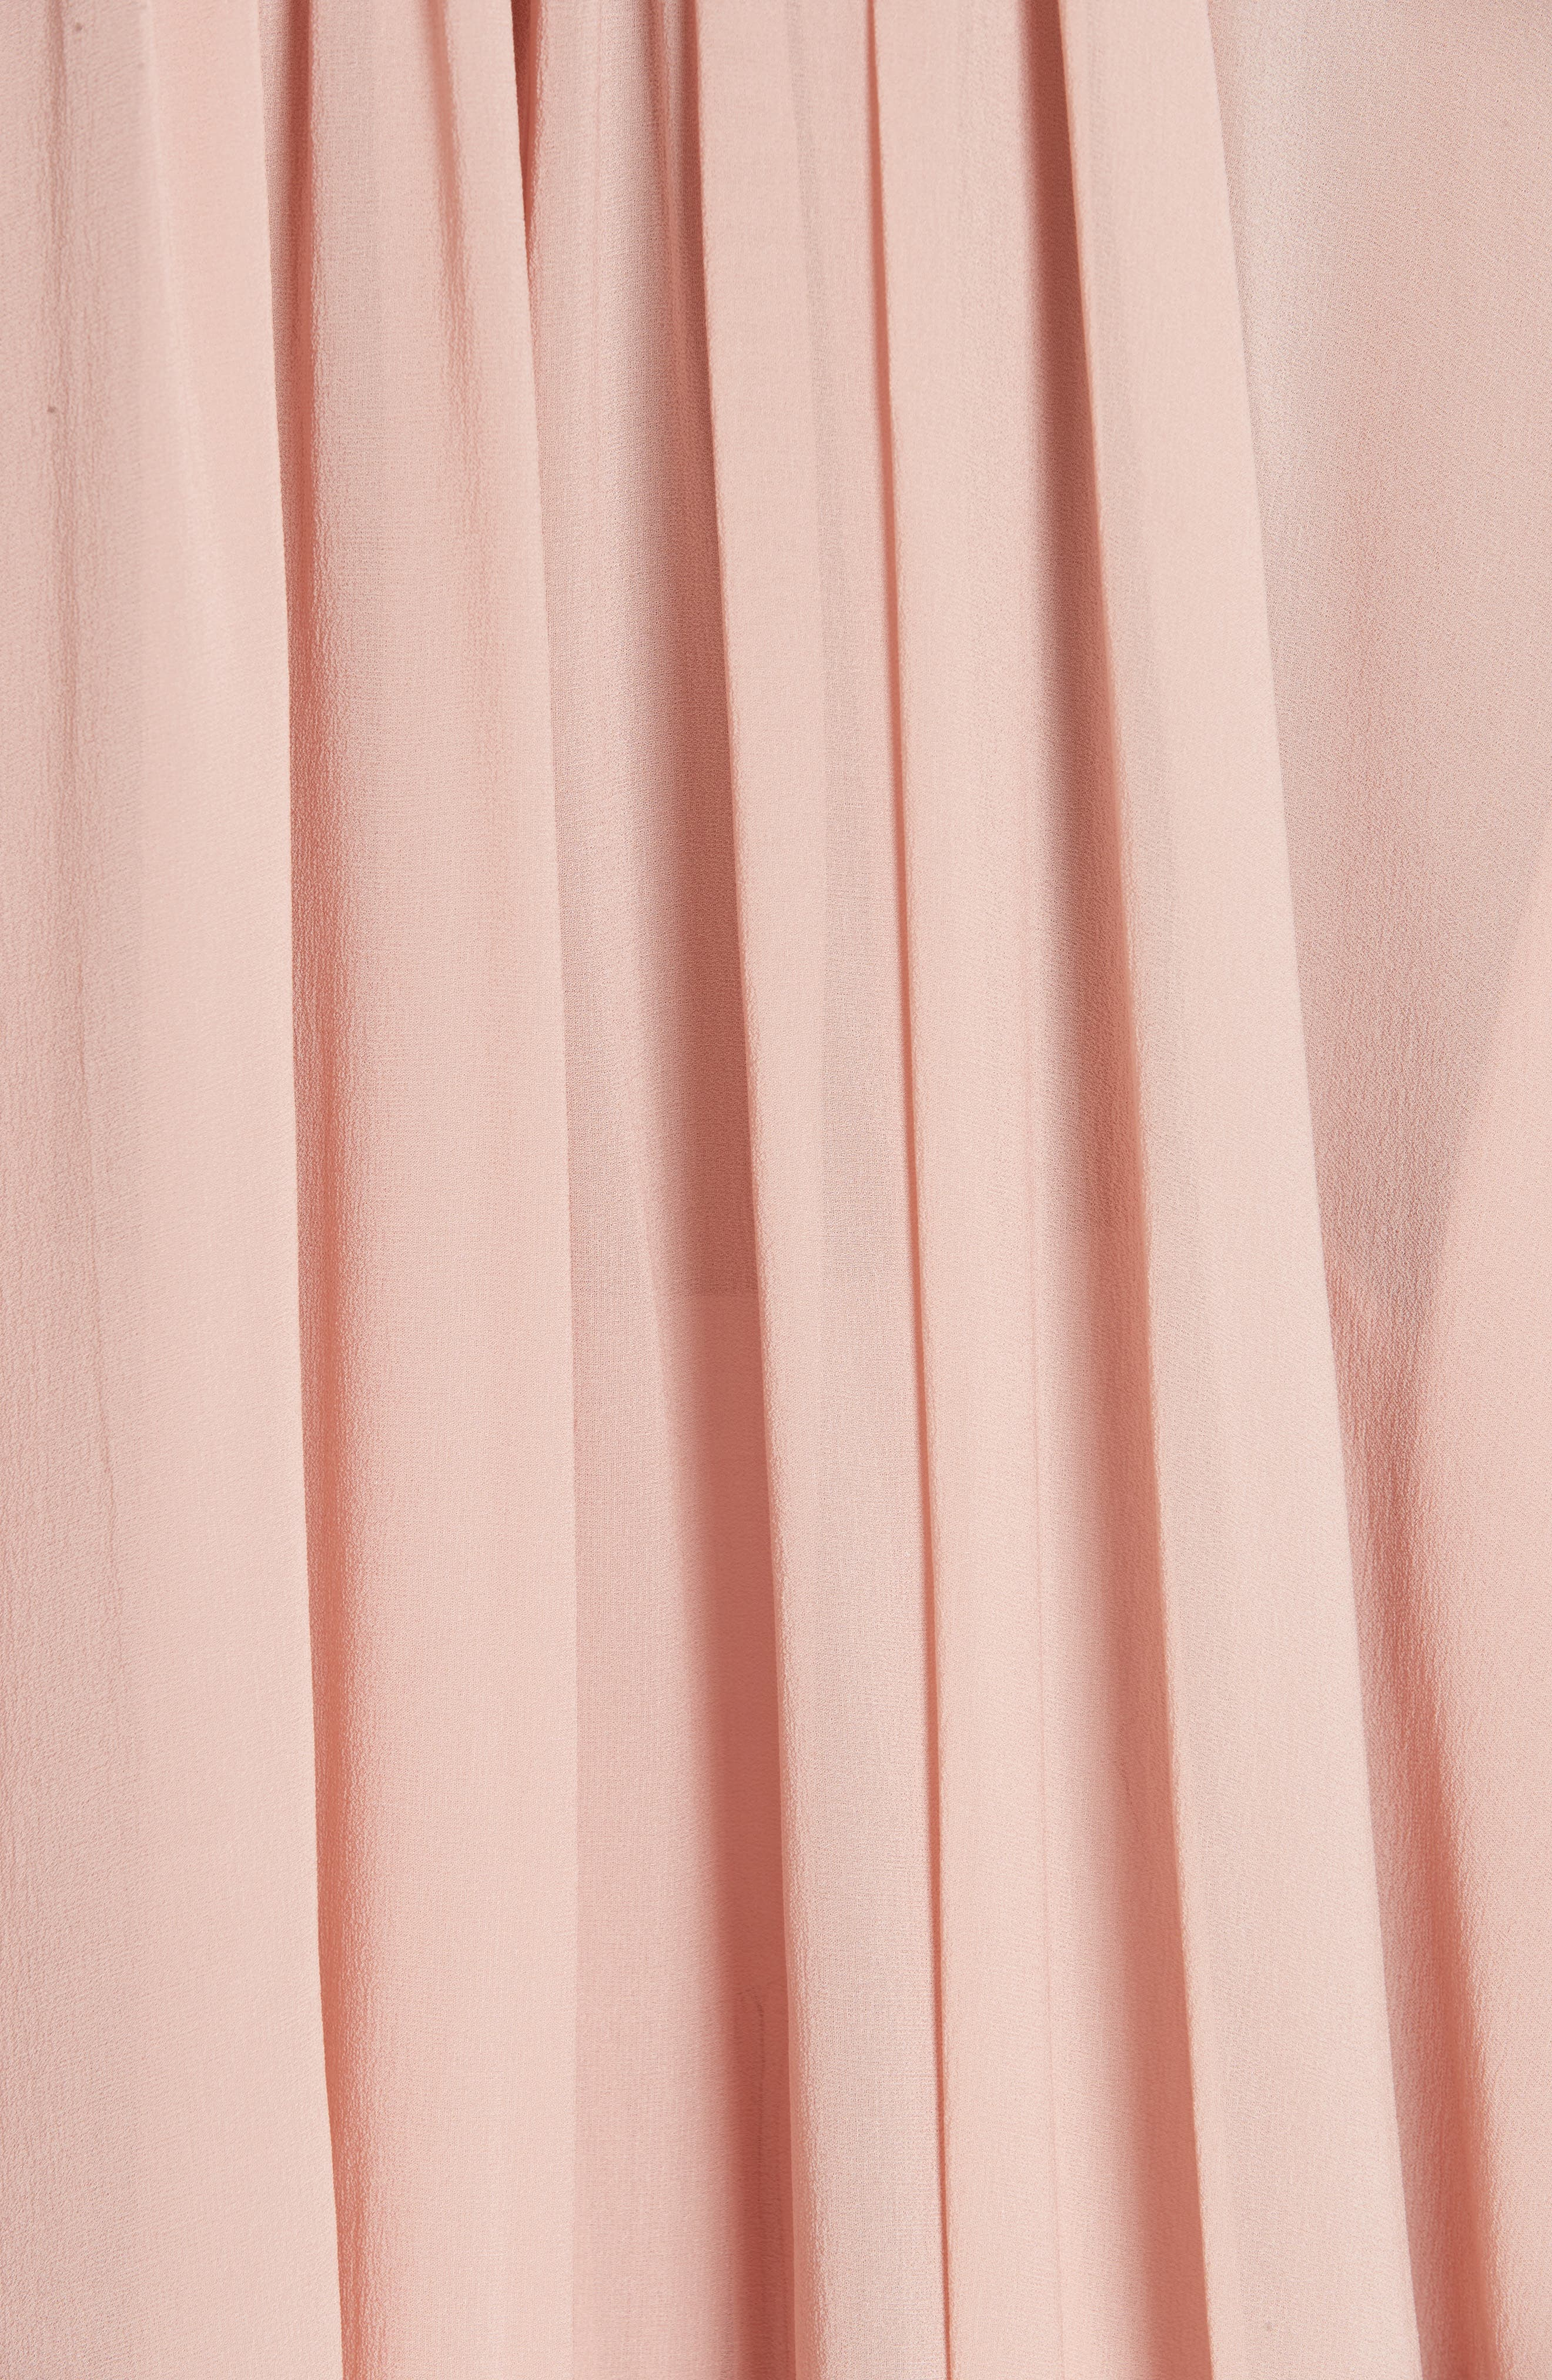 STELLA MCCARTNEY,                             Tanya Gathered Silk Top,                             Alternate thumbnail 5, color,                             650